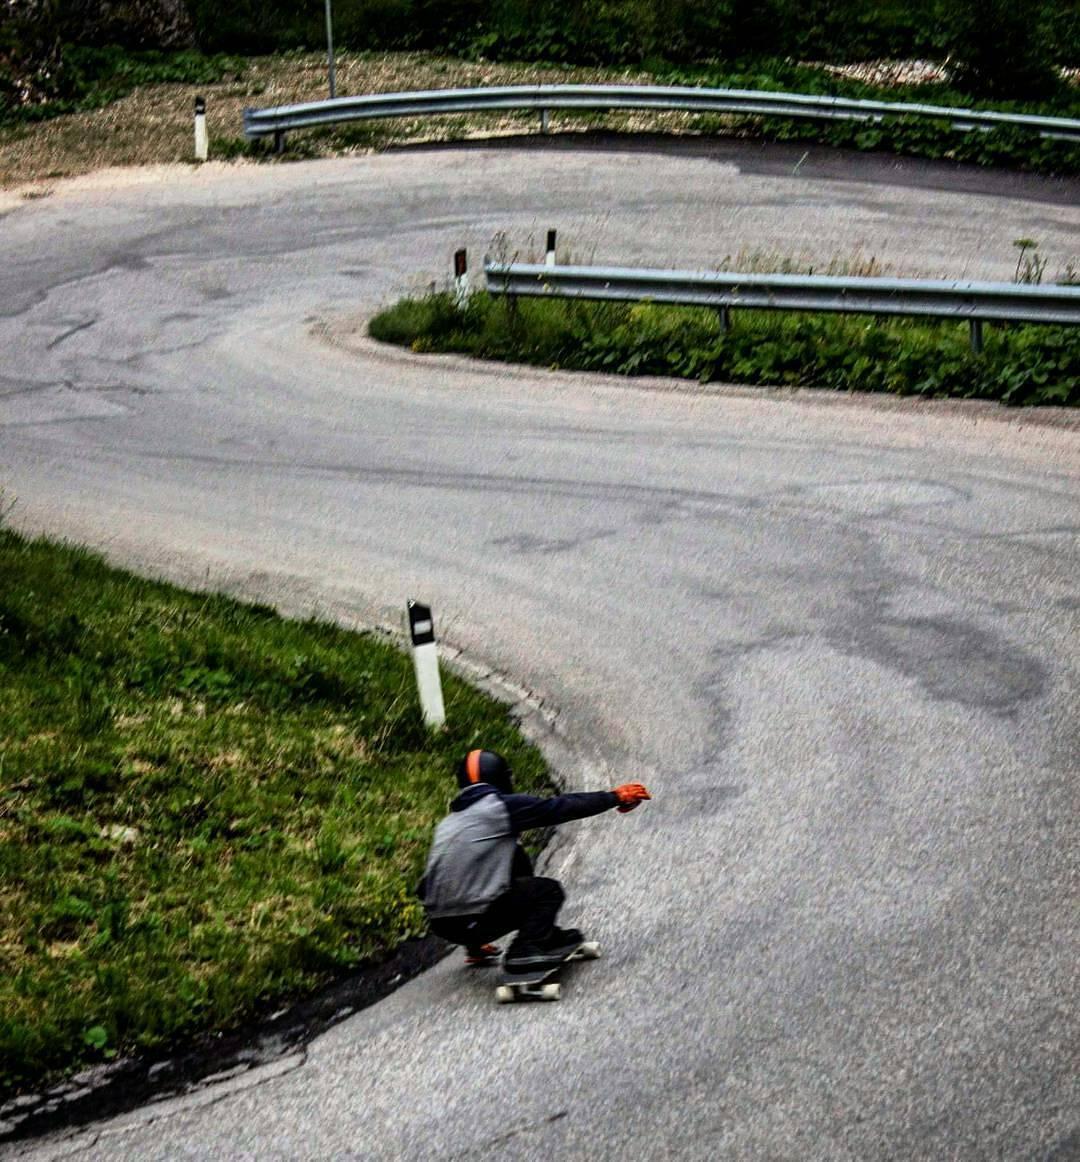 @niko_dh on a 10km downhill run in the Dolomites in Italy! #PredatorHelmets #DH6  #harfangwheels #HarfangAbsolute